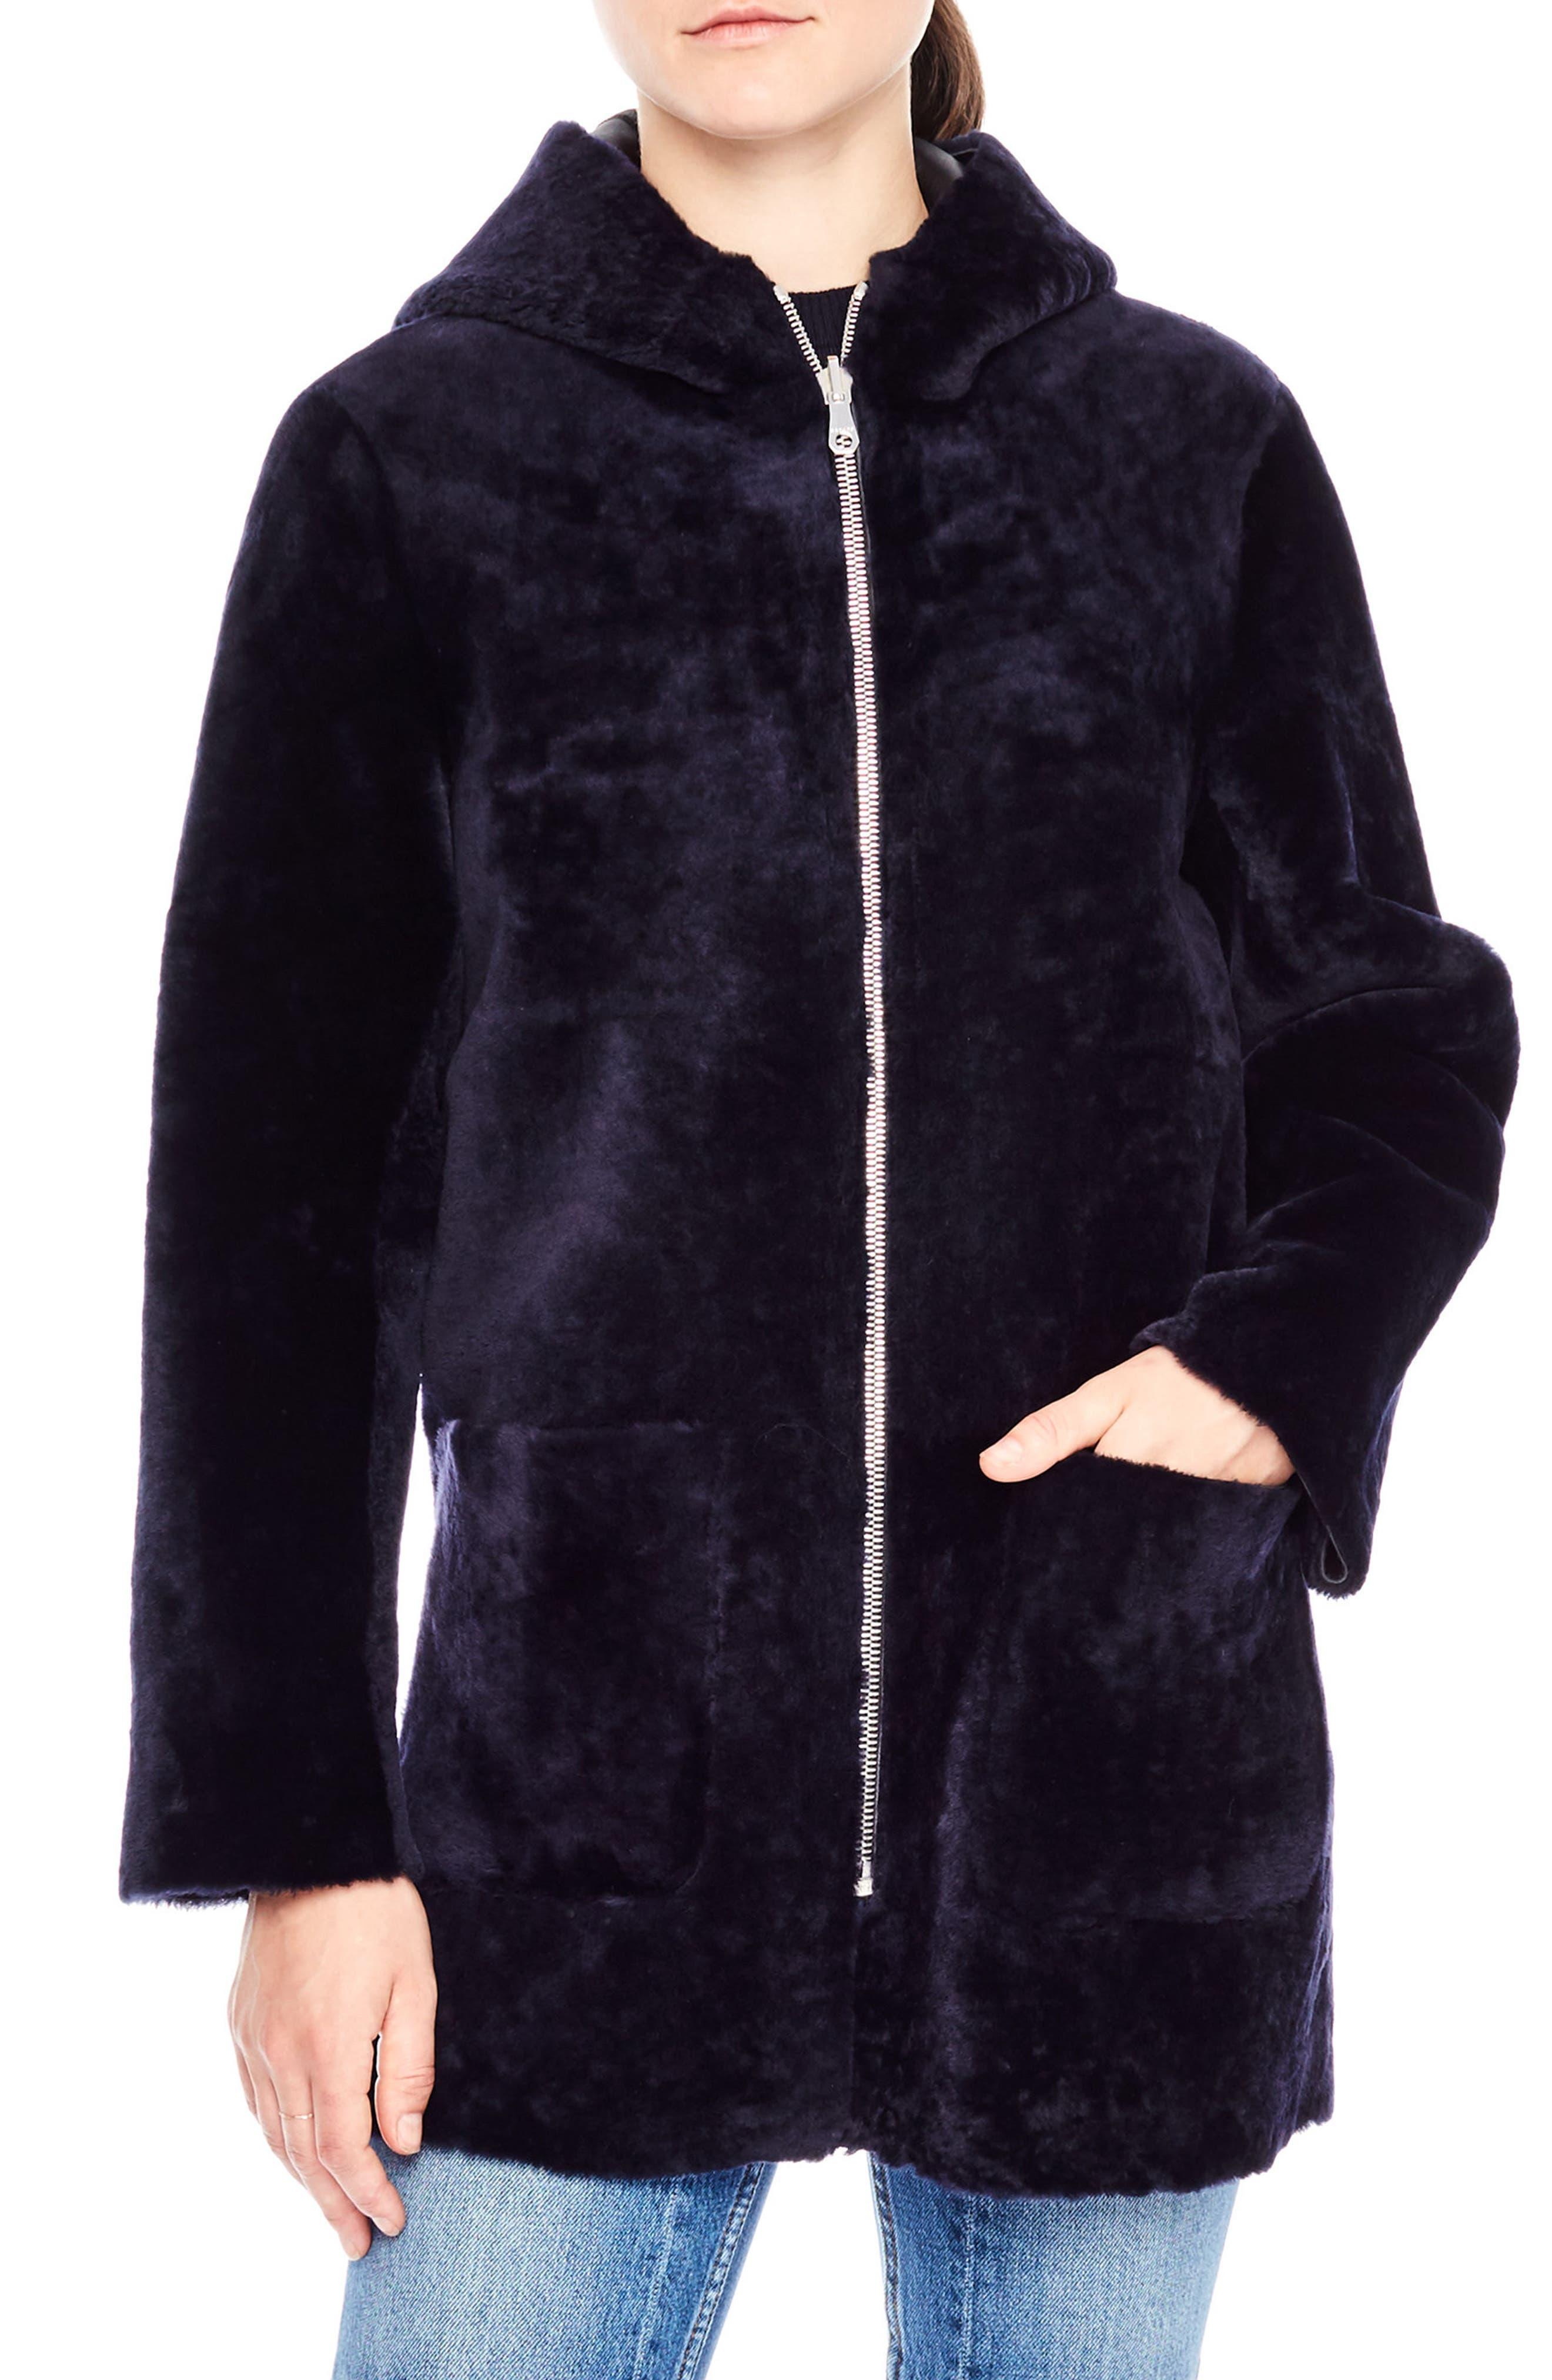 Shearling Coats & Jackets for Women   Nordstrom   Nordstrom